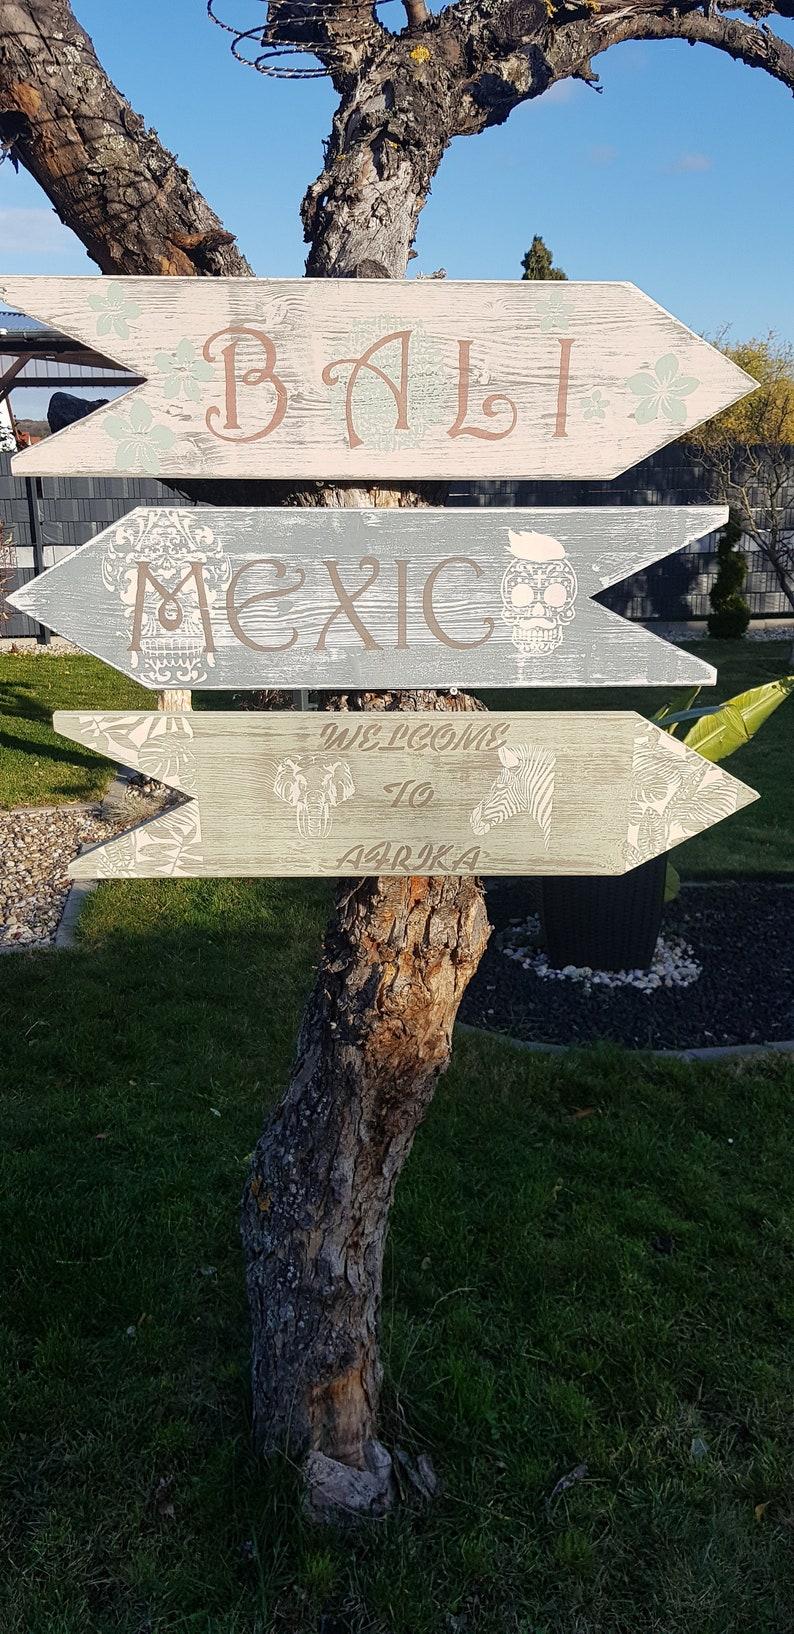 Signposts gardenwood sign personalizedsignposts holiday image 0